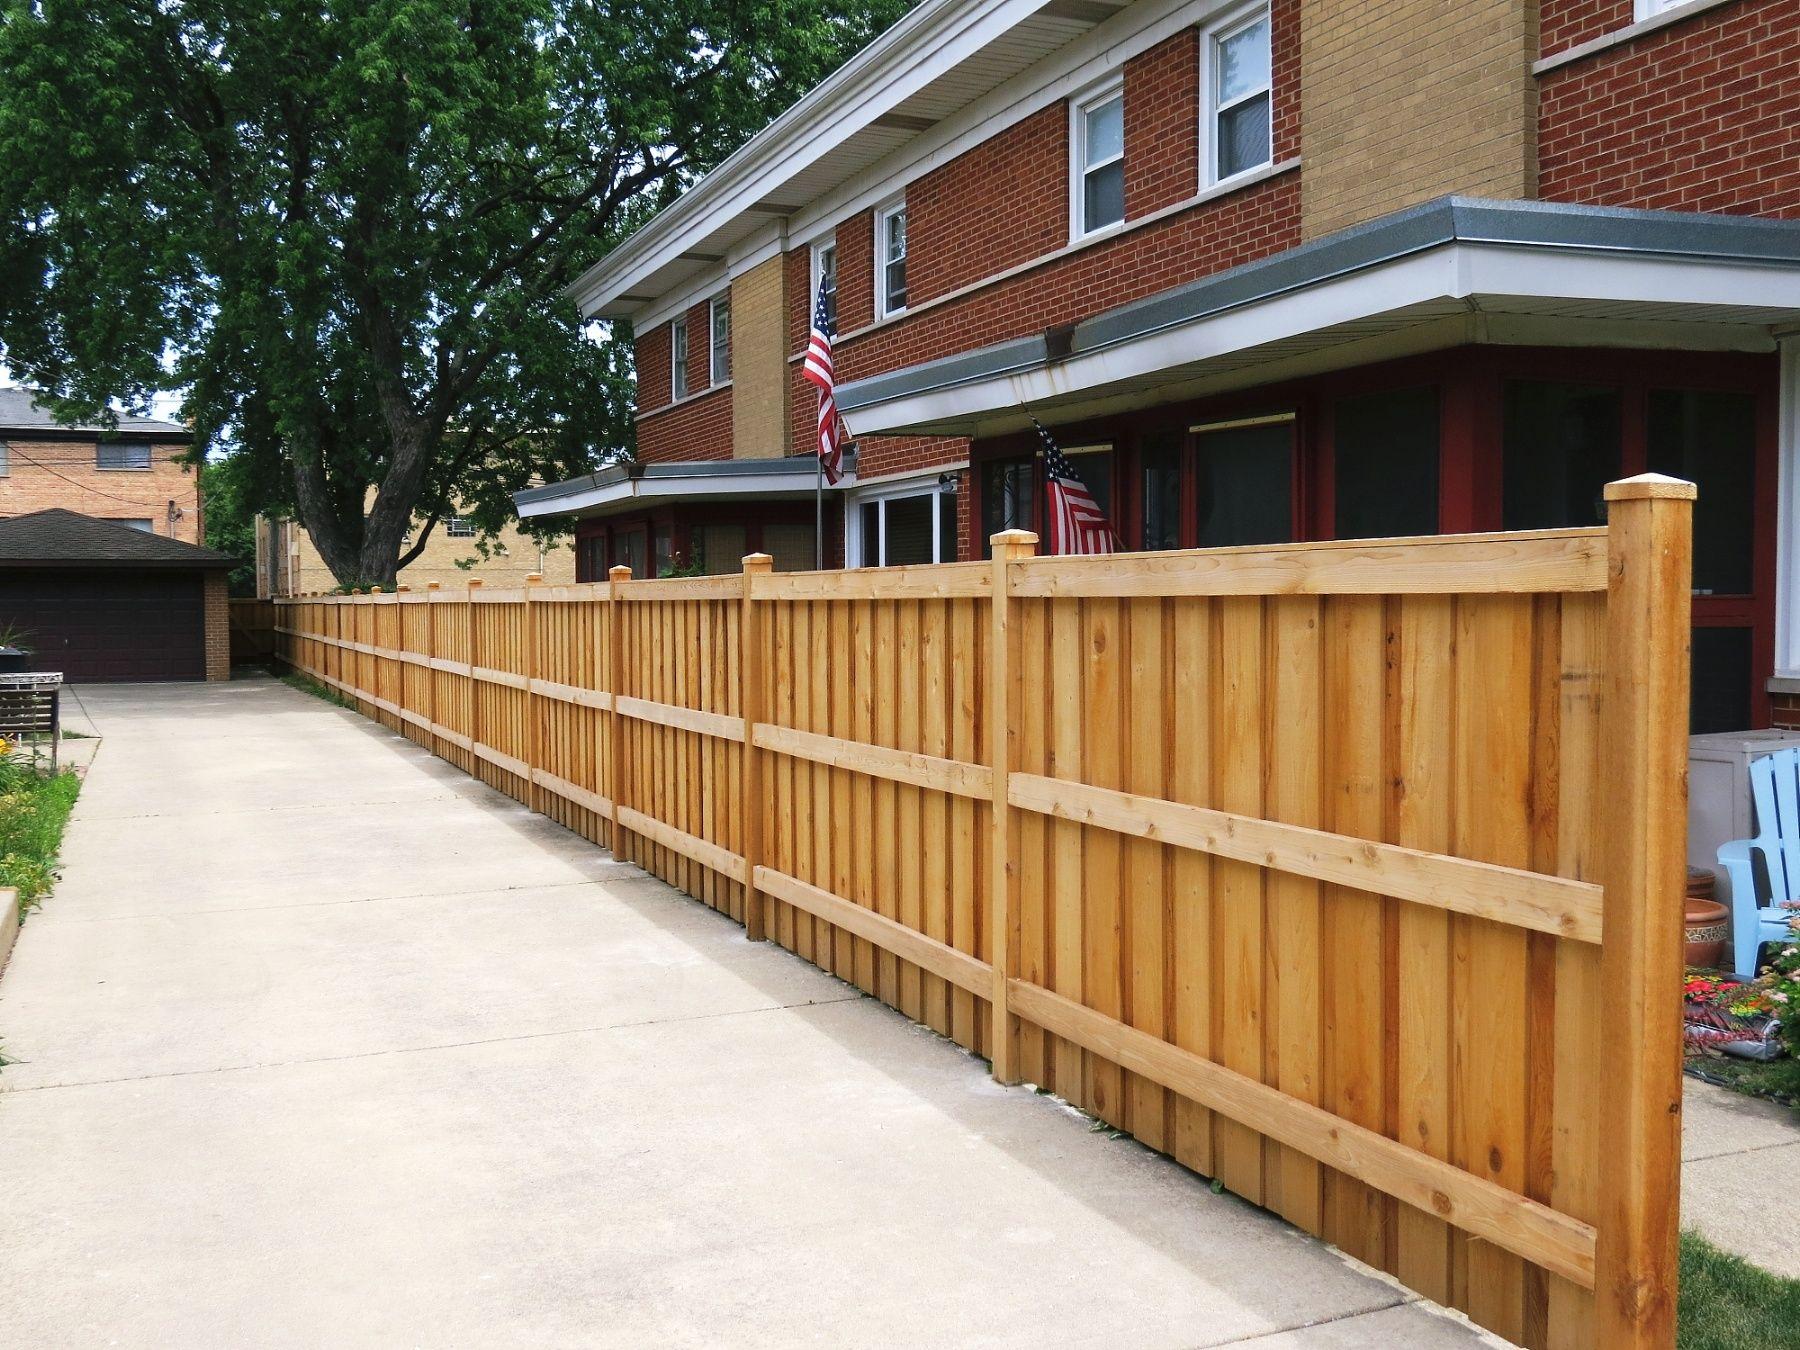 Picture of: Bob Jaacks Rustic Wood Fencing Decks Cedar Board On Batten Solid Top Fence Image Proview